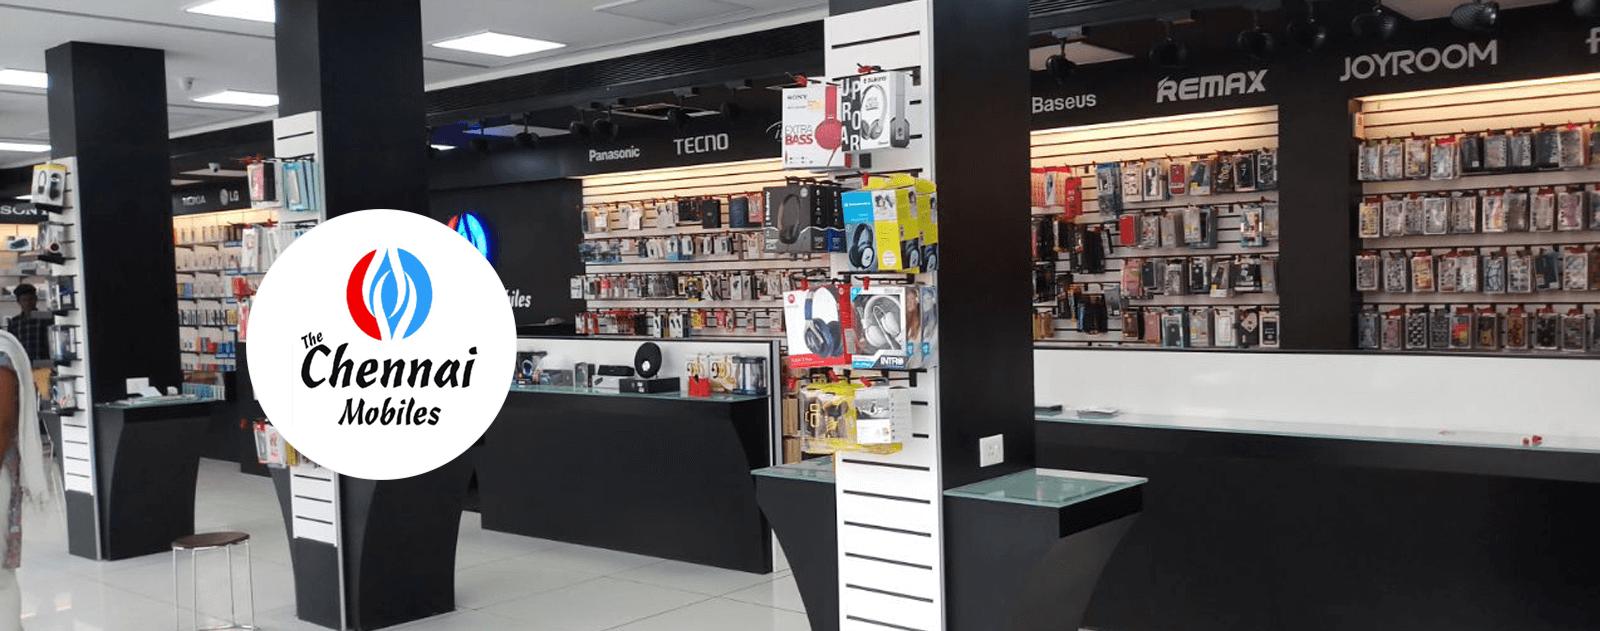 Pine Labs Merchants Success Stories: The Chennai Mobile